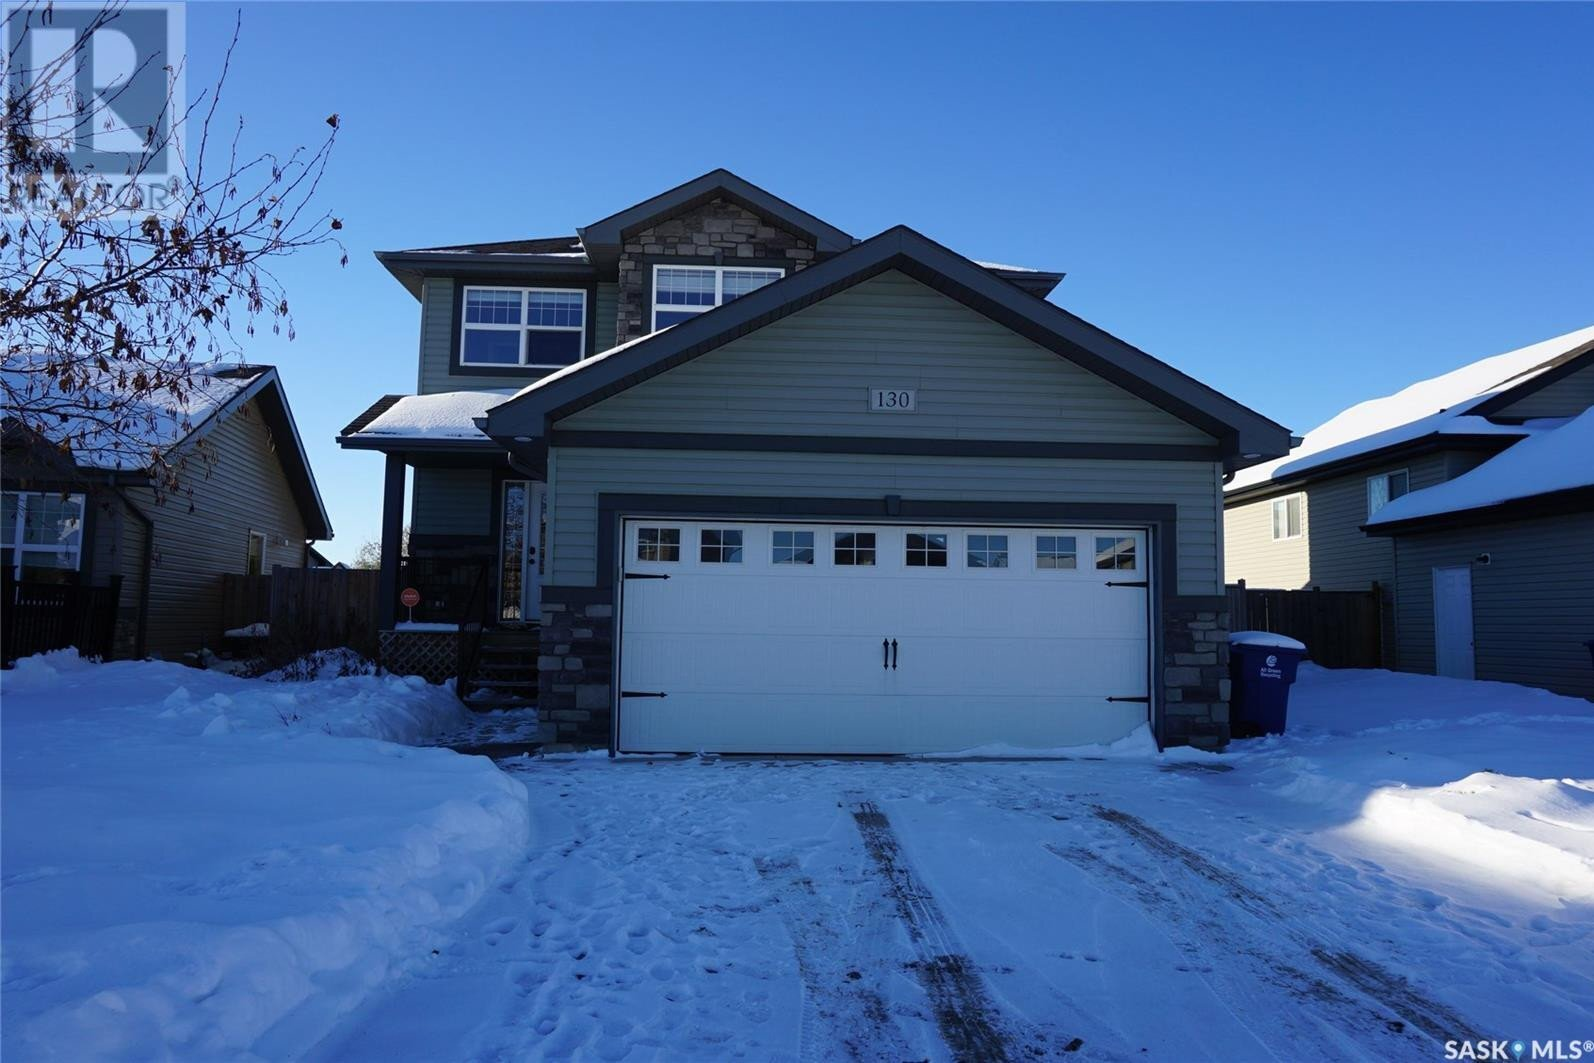 House for sale at 130 Whalley Cres Saskatoon Saskatchewan - MLS: SK835965